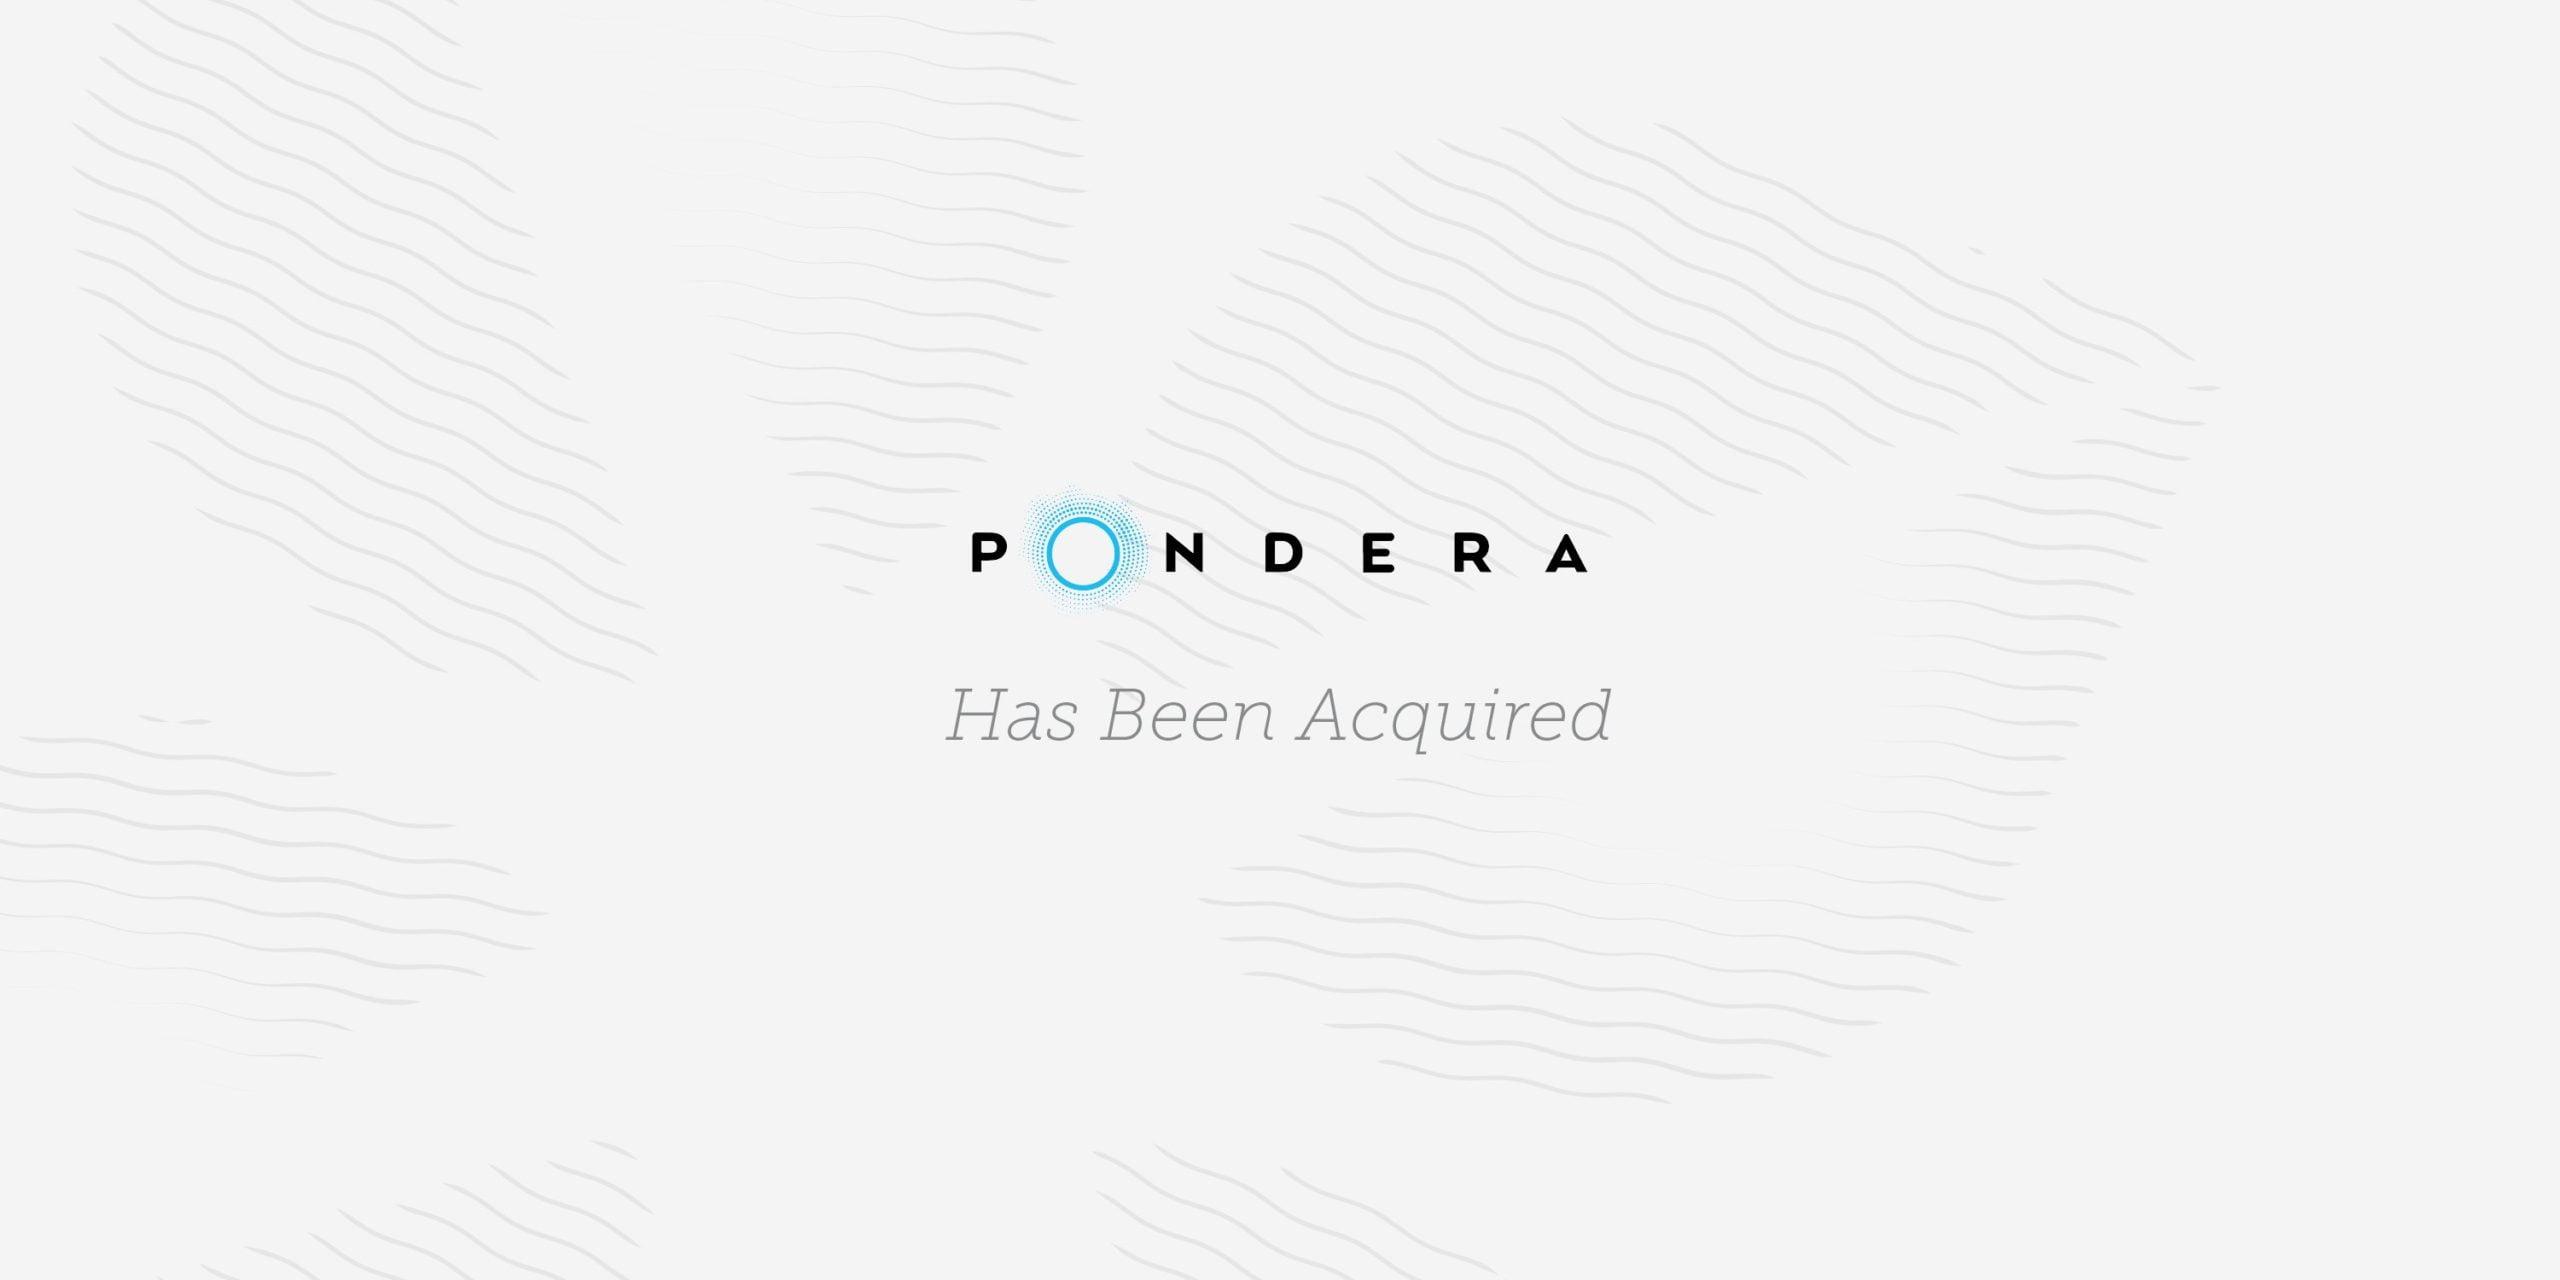 Pondera, a Serent Portfolio Company, Has Been Acquired